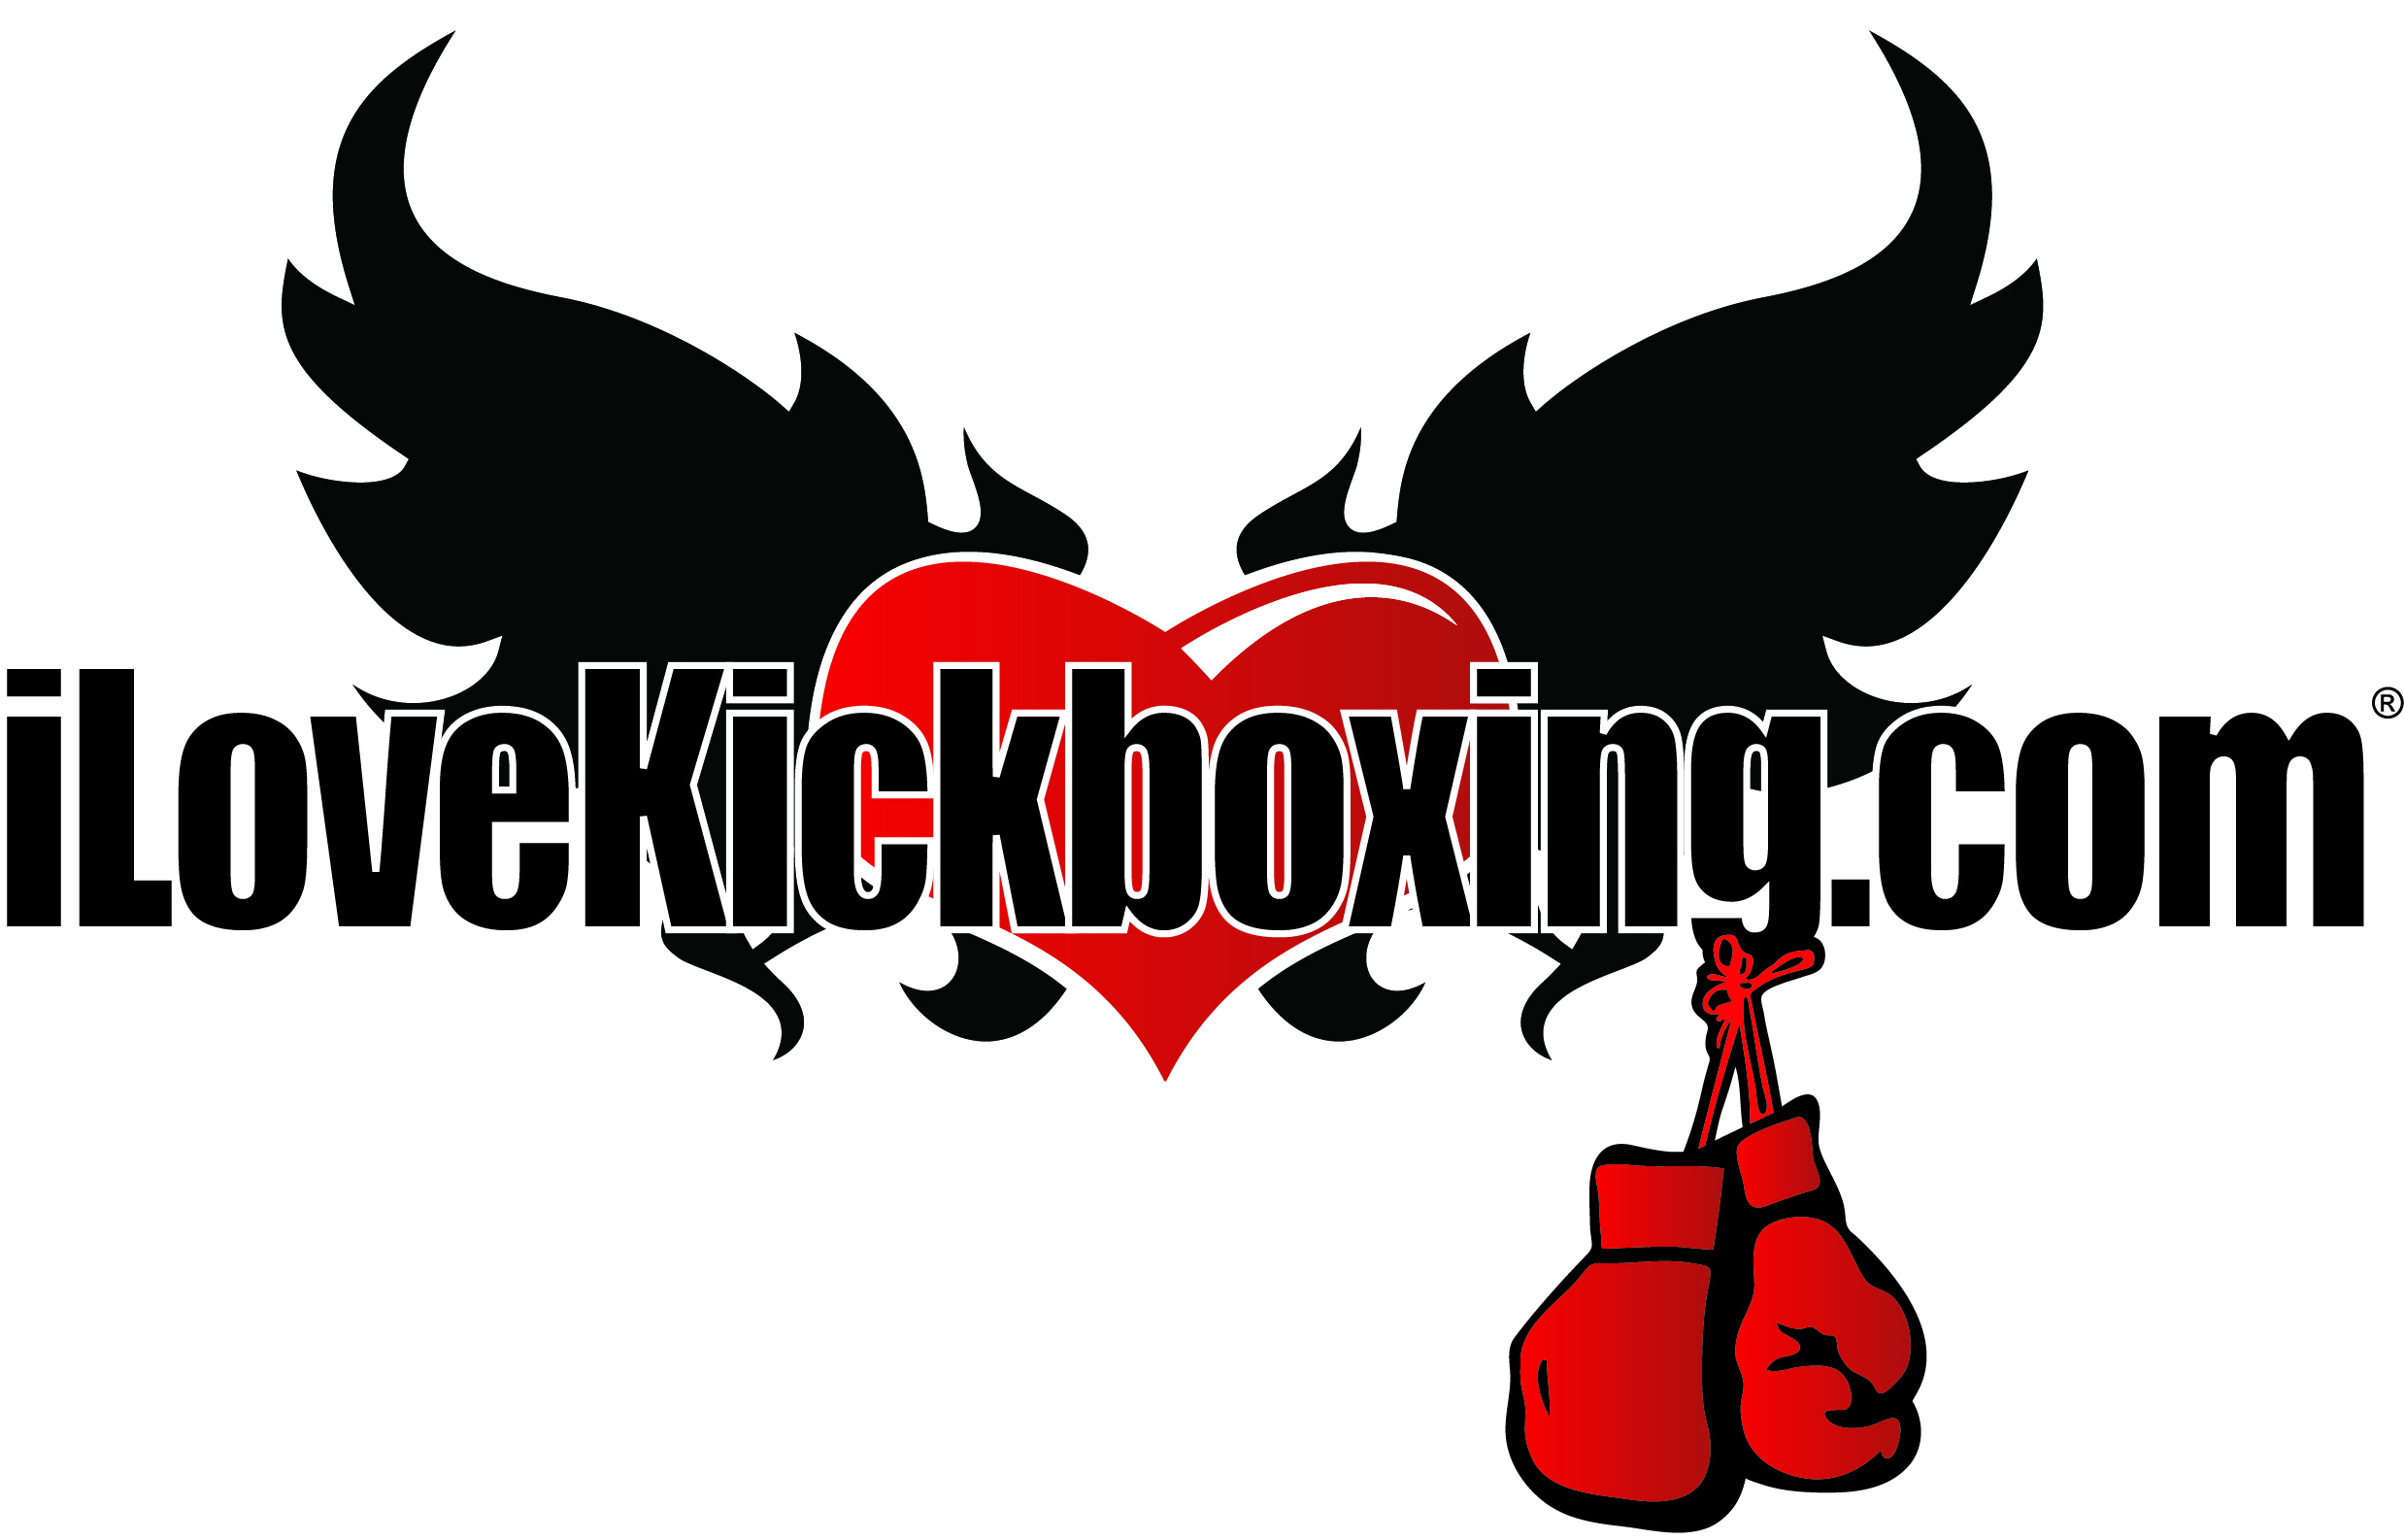 I Love Kickboxing - Las Vegas - Las Vegas, NV - Health Clubs & Gyms